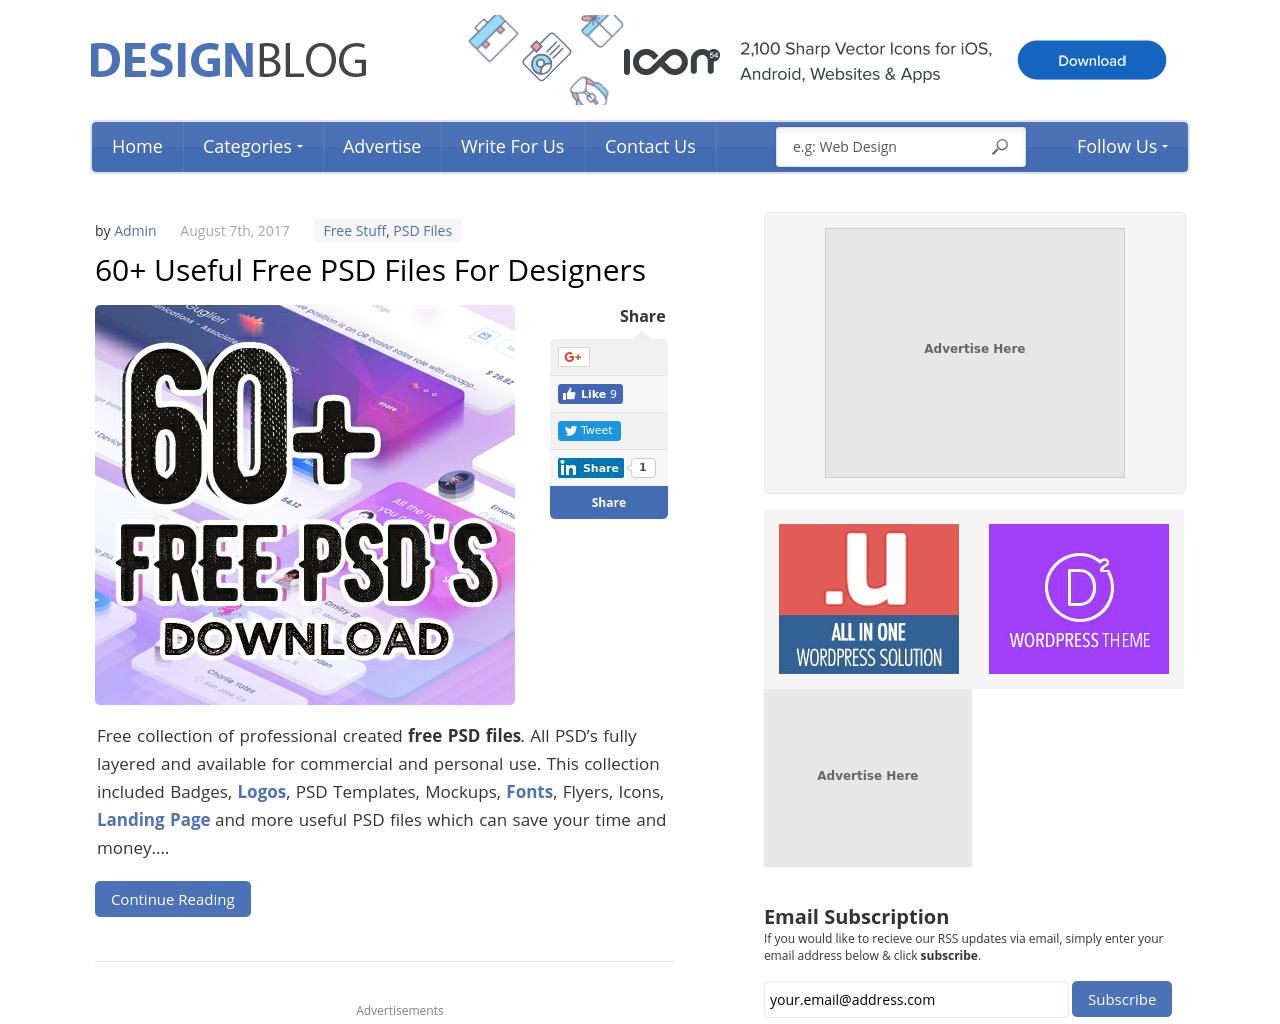 Design-Blog-Advertising-Reviews-Pricing